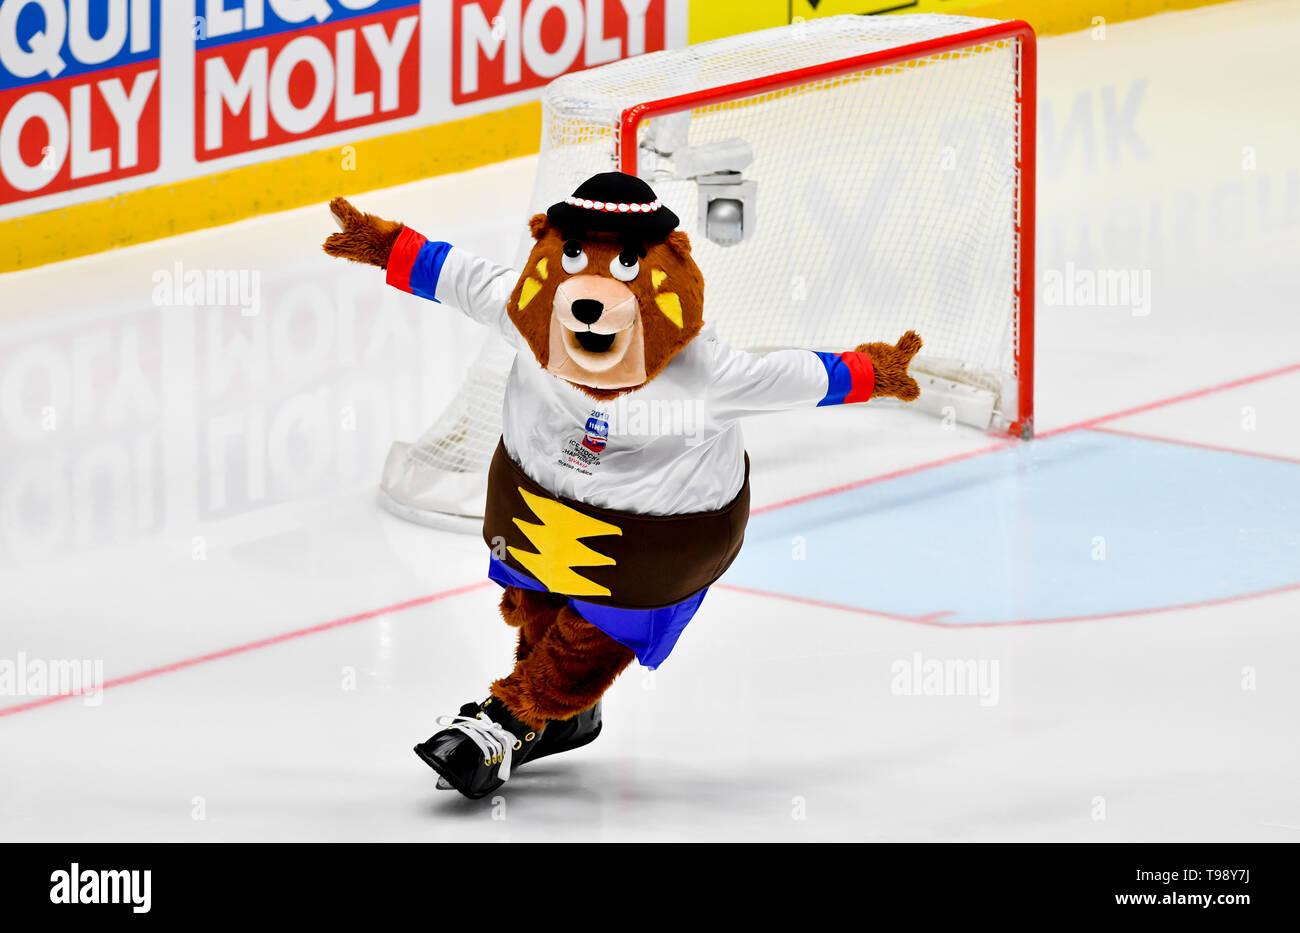 A mascot of the 2019 IIHF World Championship bear Macejko skates during the match between Czech Republic and Latvia within the 2019 IIHF World Champio - Stock Image